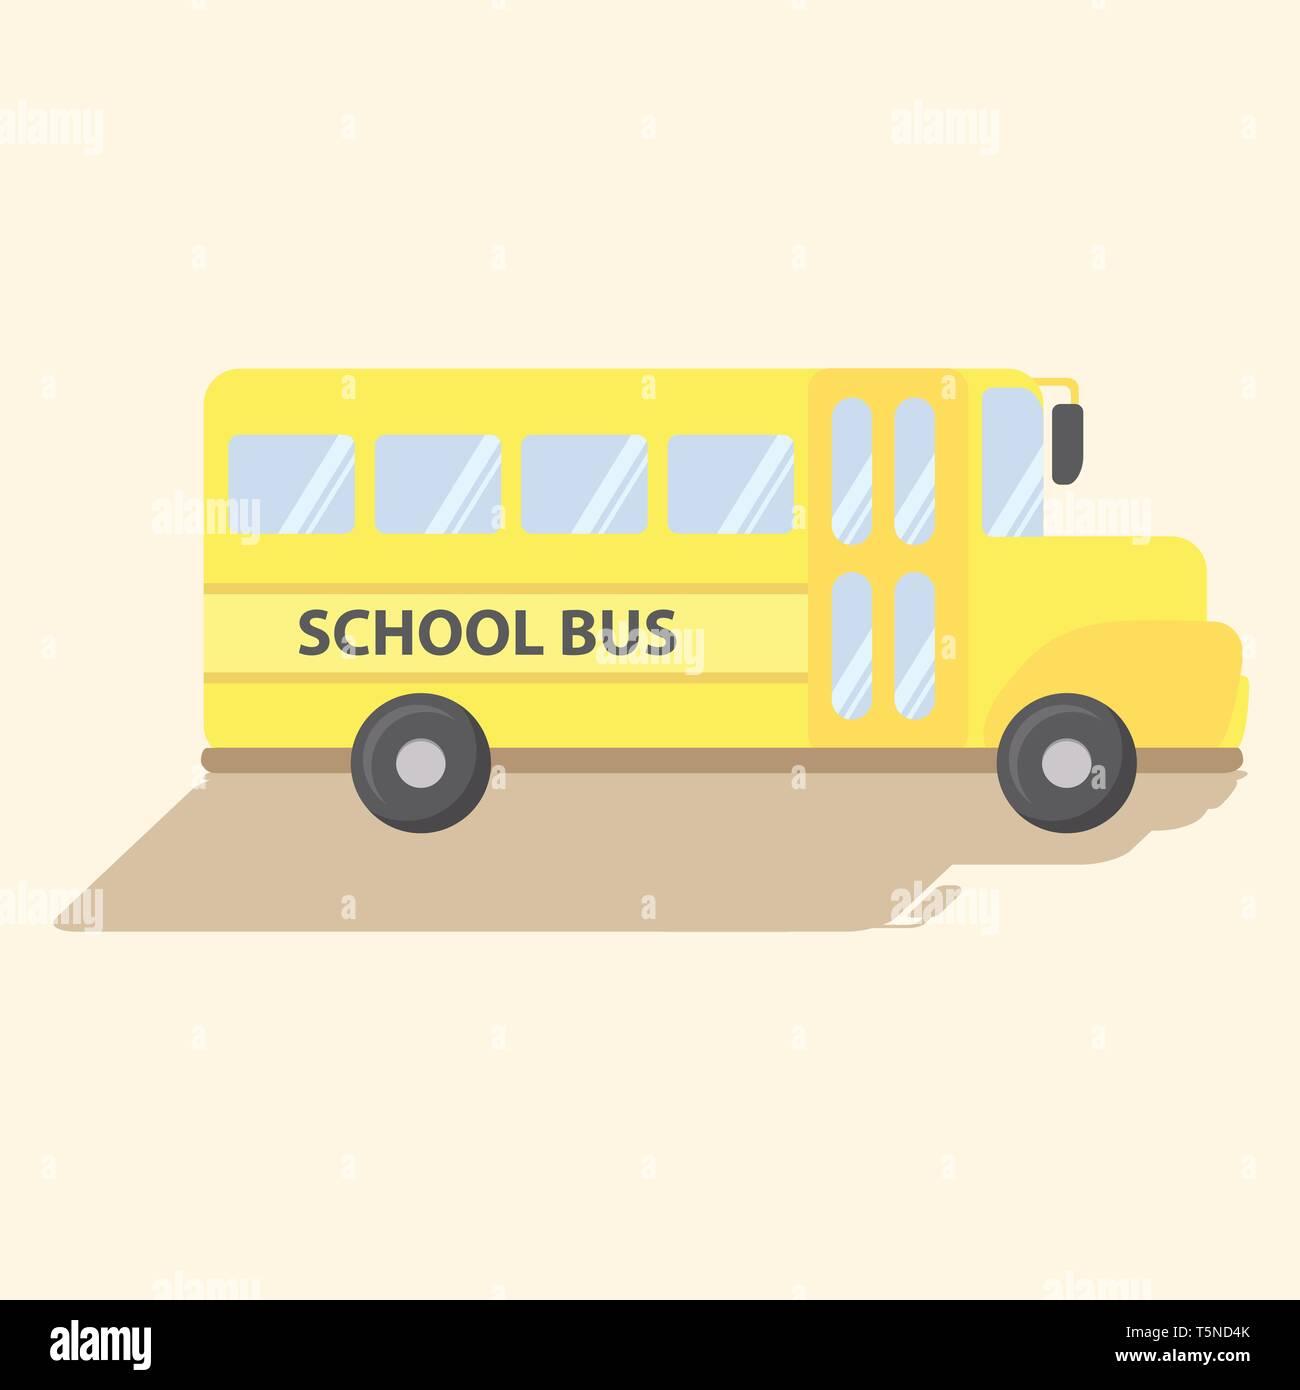 School Transportation Bus Yellow Vector Cartoon Illustration - Stock Image